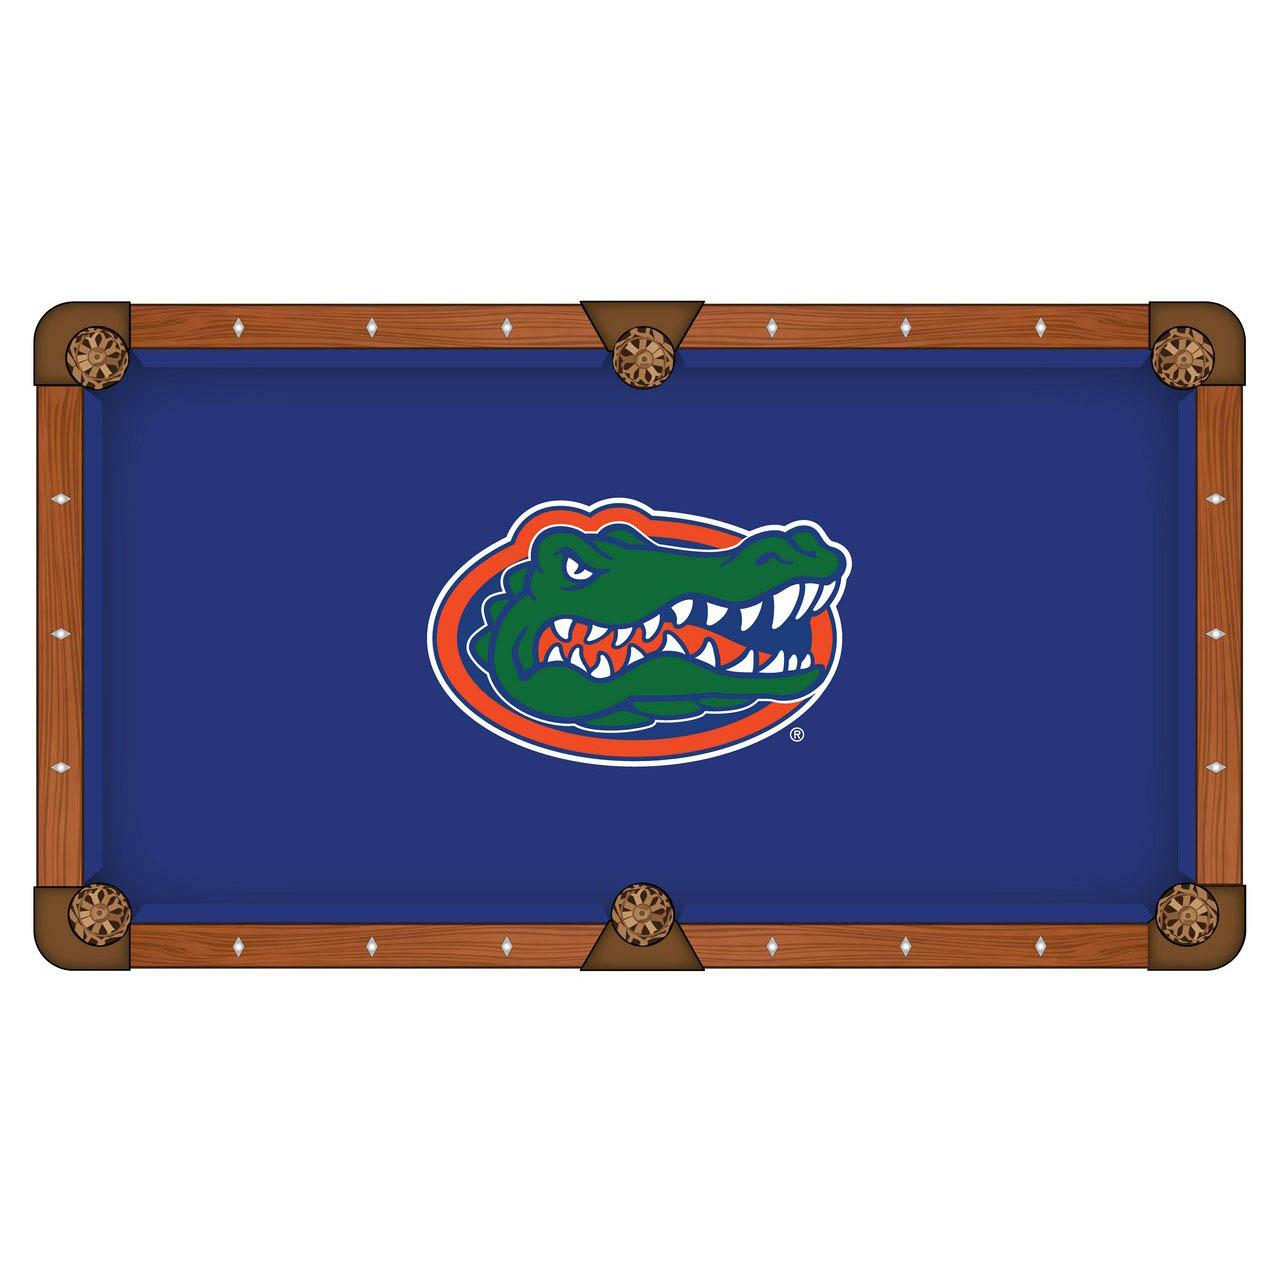 Lovable University Florida Pool Table Cloth Product Photo